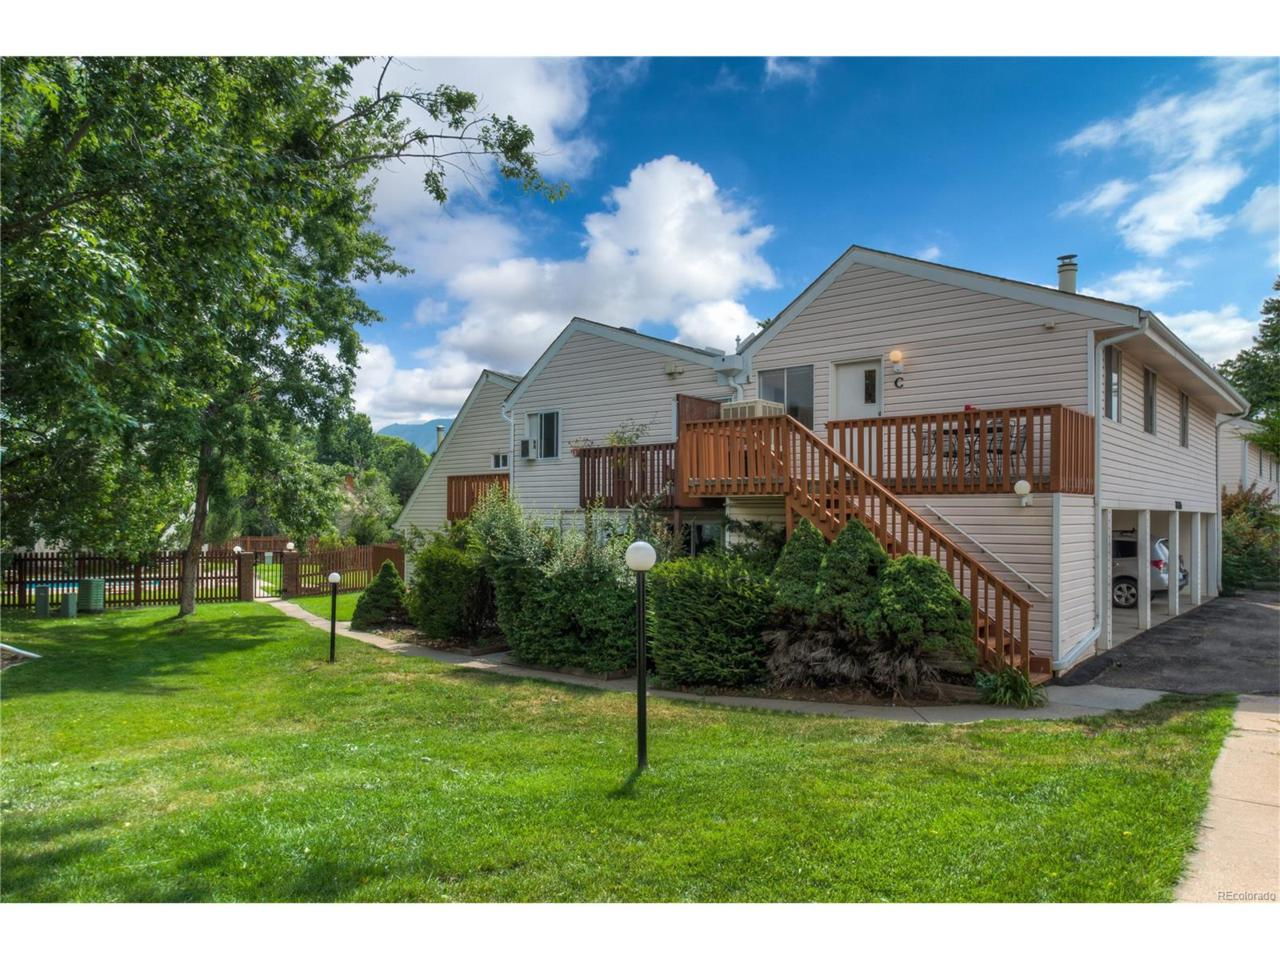 3660 Iris Avenue C, Boulder, CO 80301 (MLS #6646364) :: 8z Real Estate